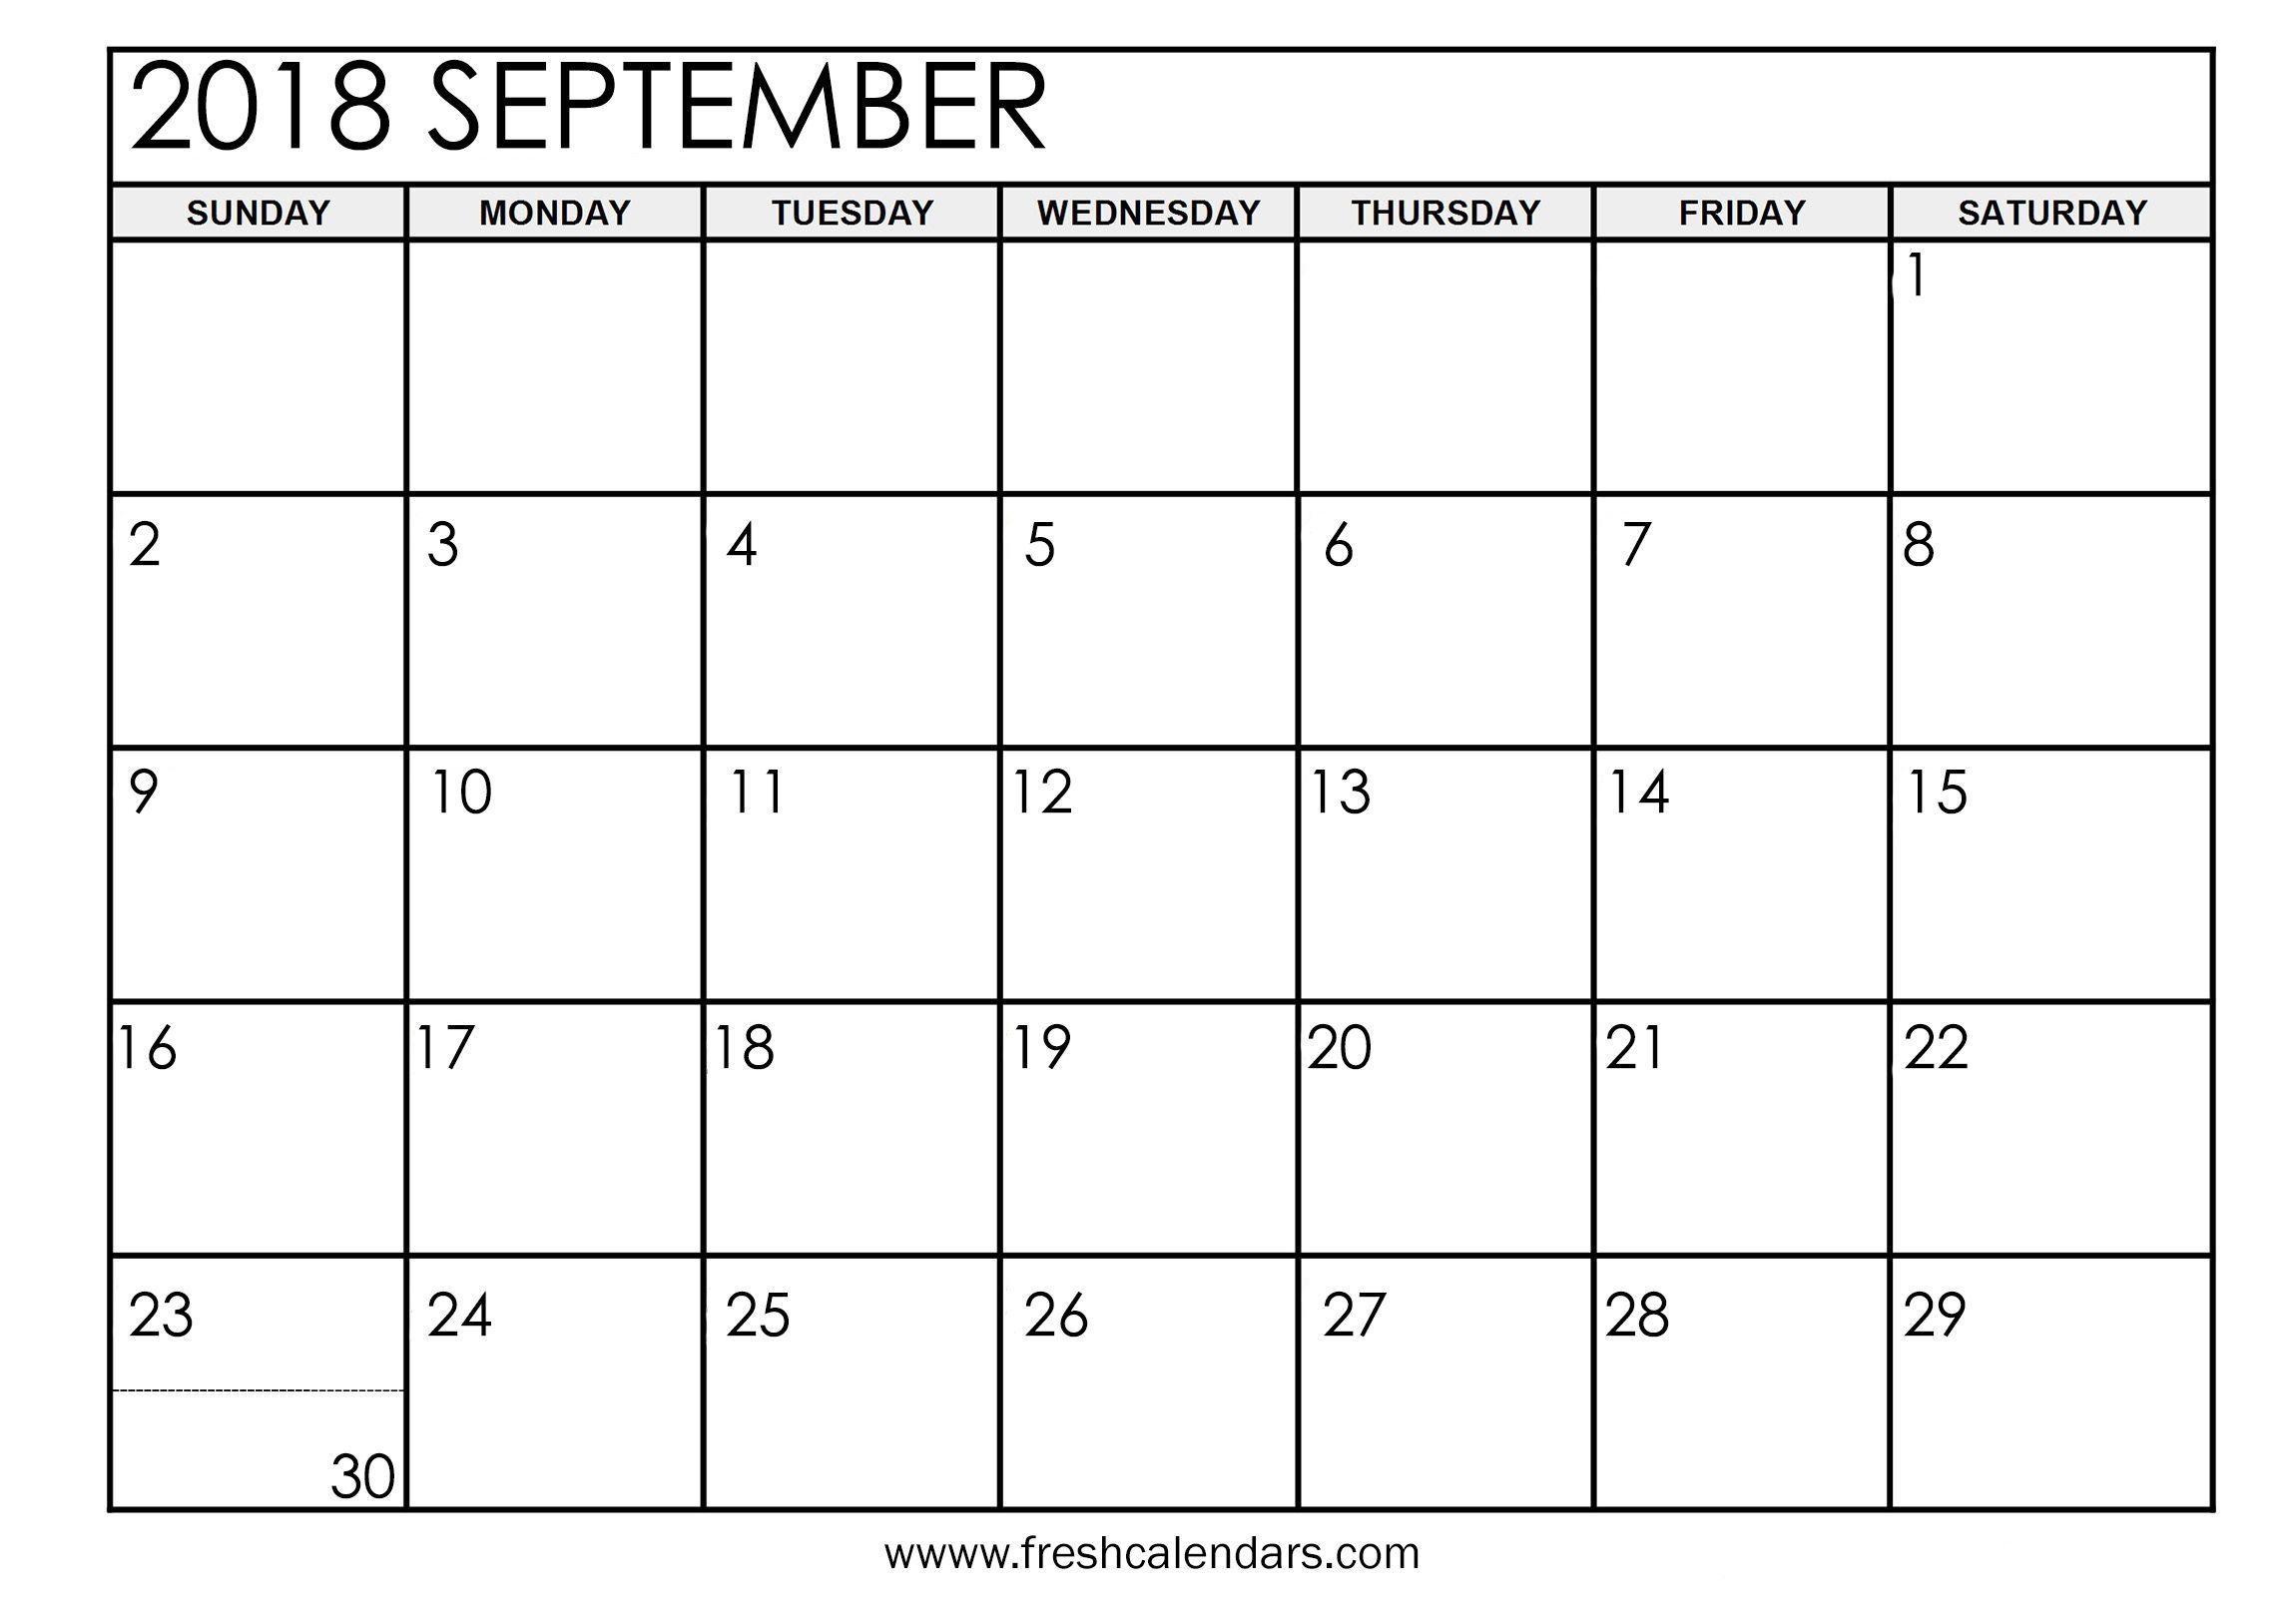 037 Printable September Calendar In Sensational 2018 Word August in September Calendar Printable Template